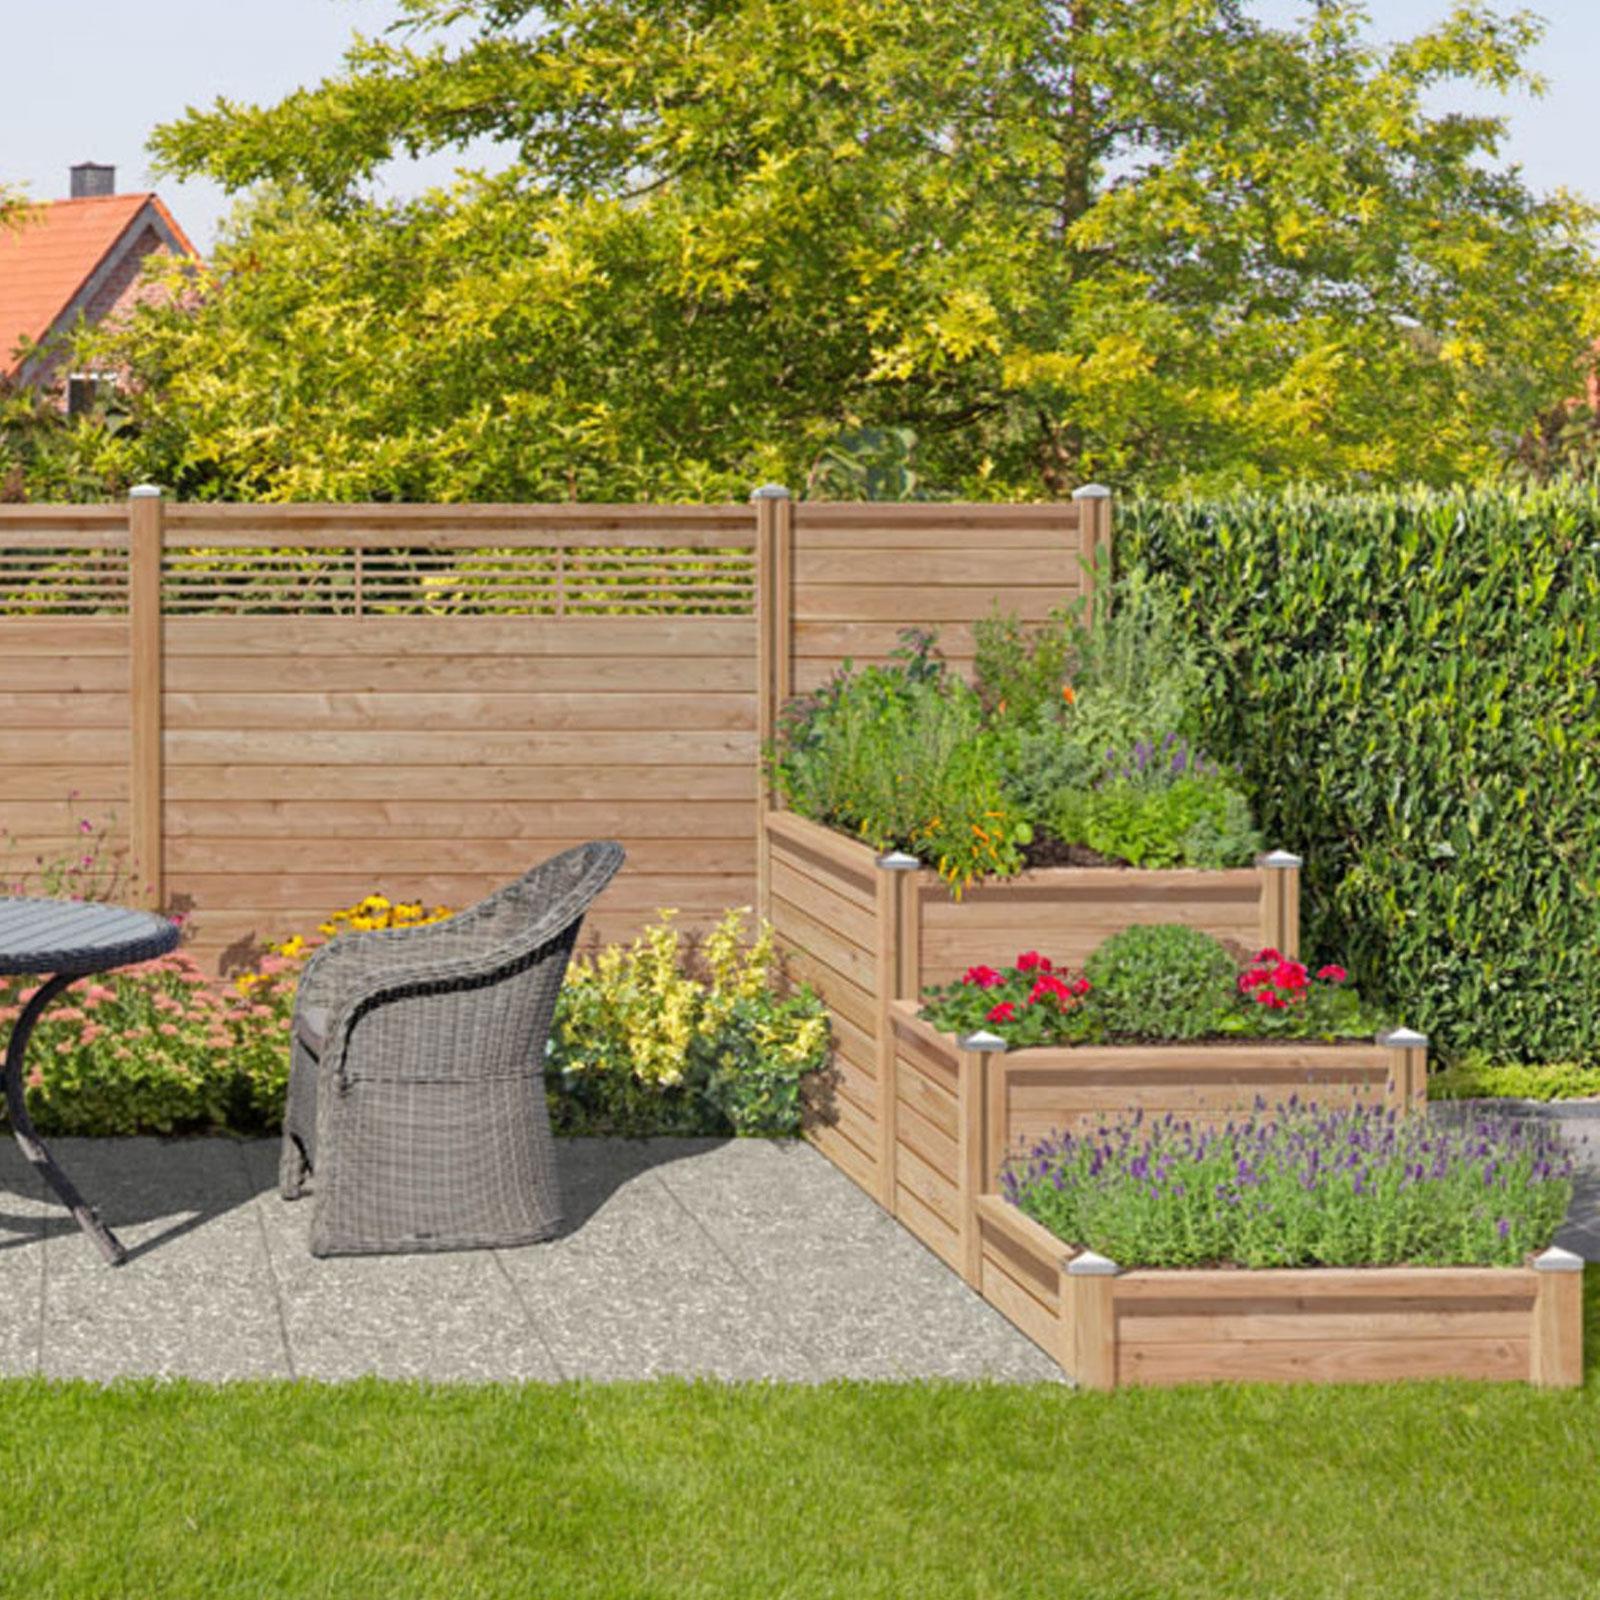 Holzzaun Sichtschutzzaun 180x180 Lamellenzaun Gartenzaun Steckzaun grau braun